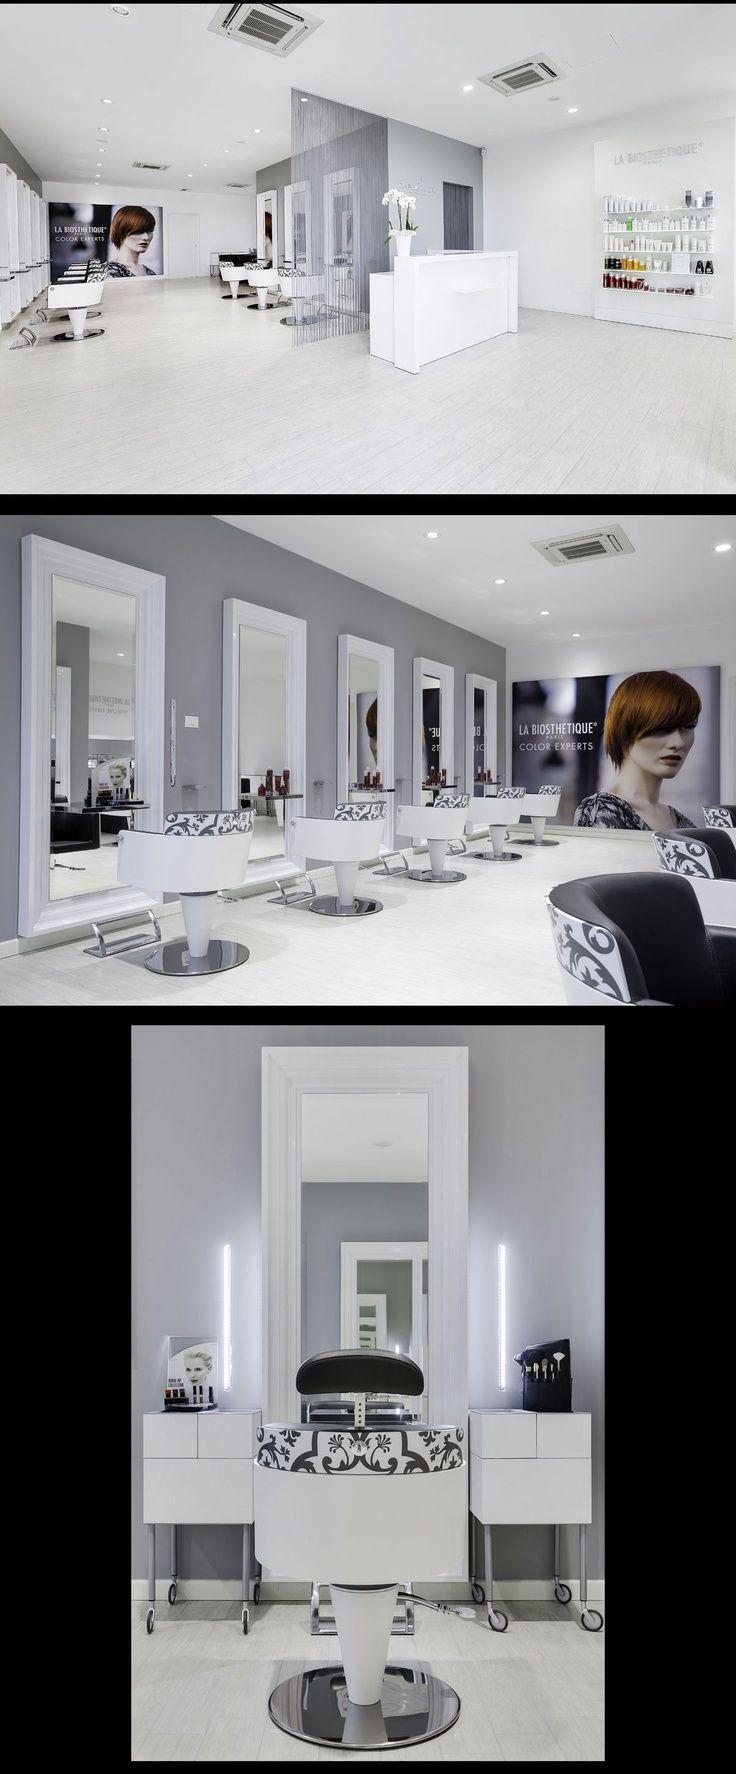 Hair Salon Capolavoro - Mantova (Italy) - Salon Design by Mauro Cimarosti - | hair-sublime.com